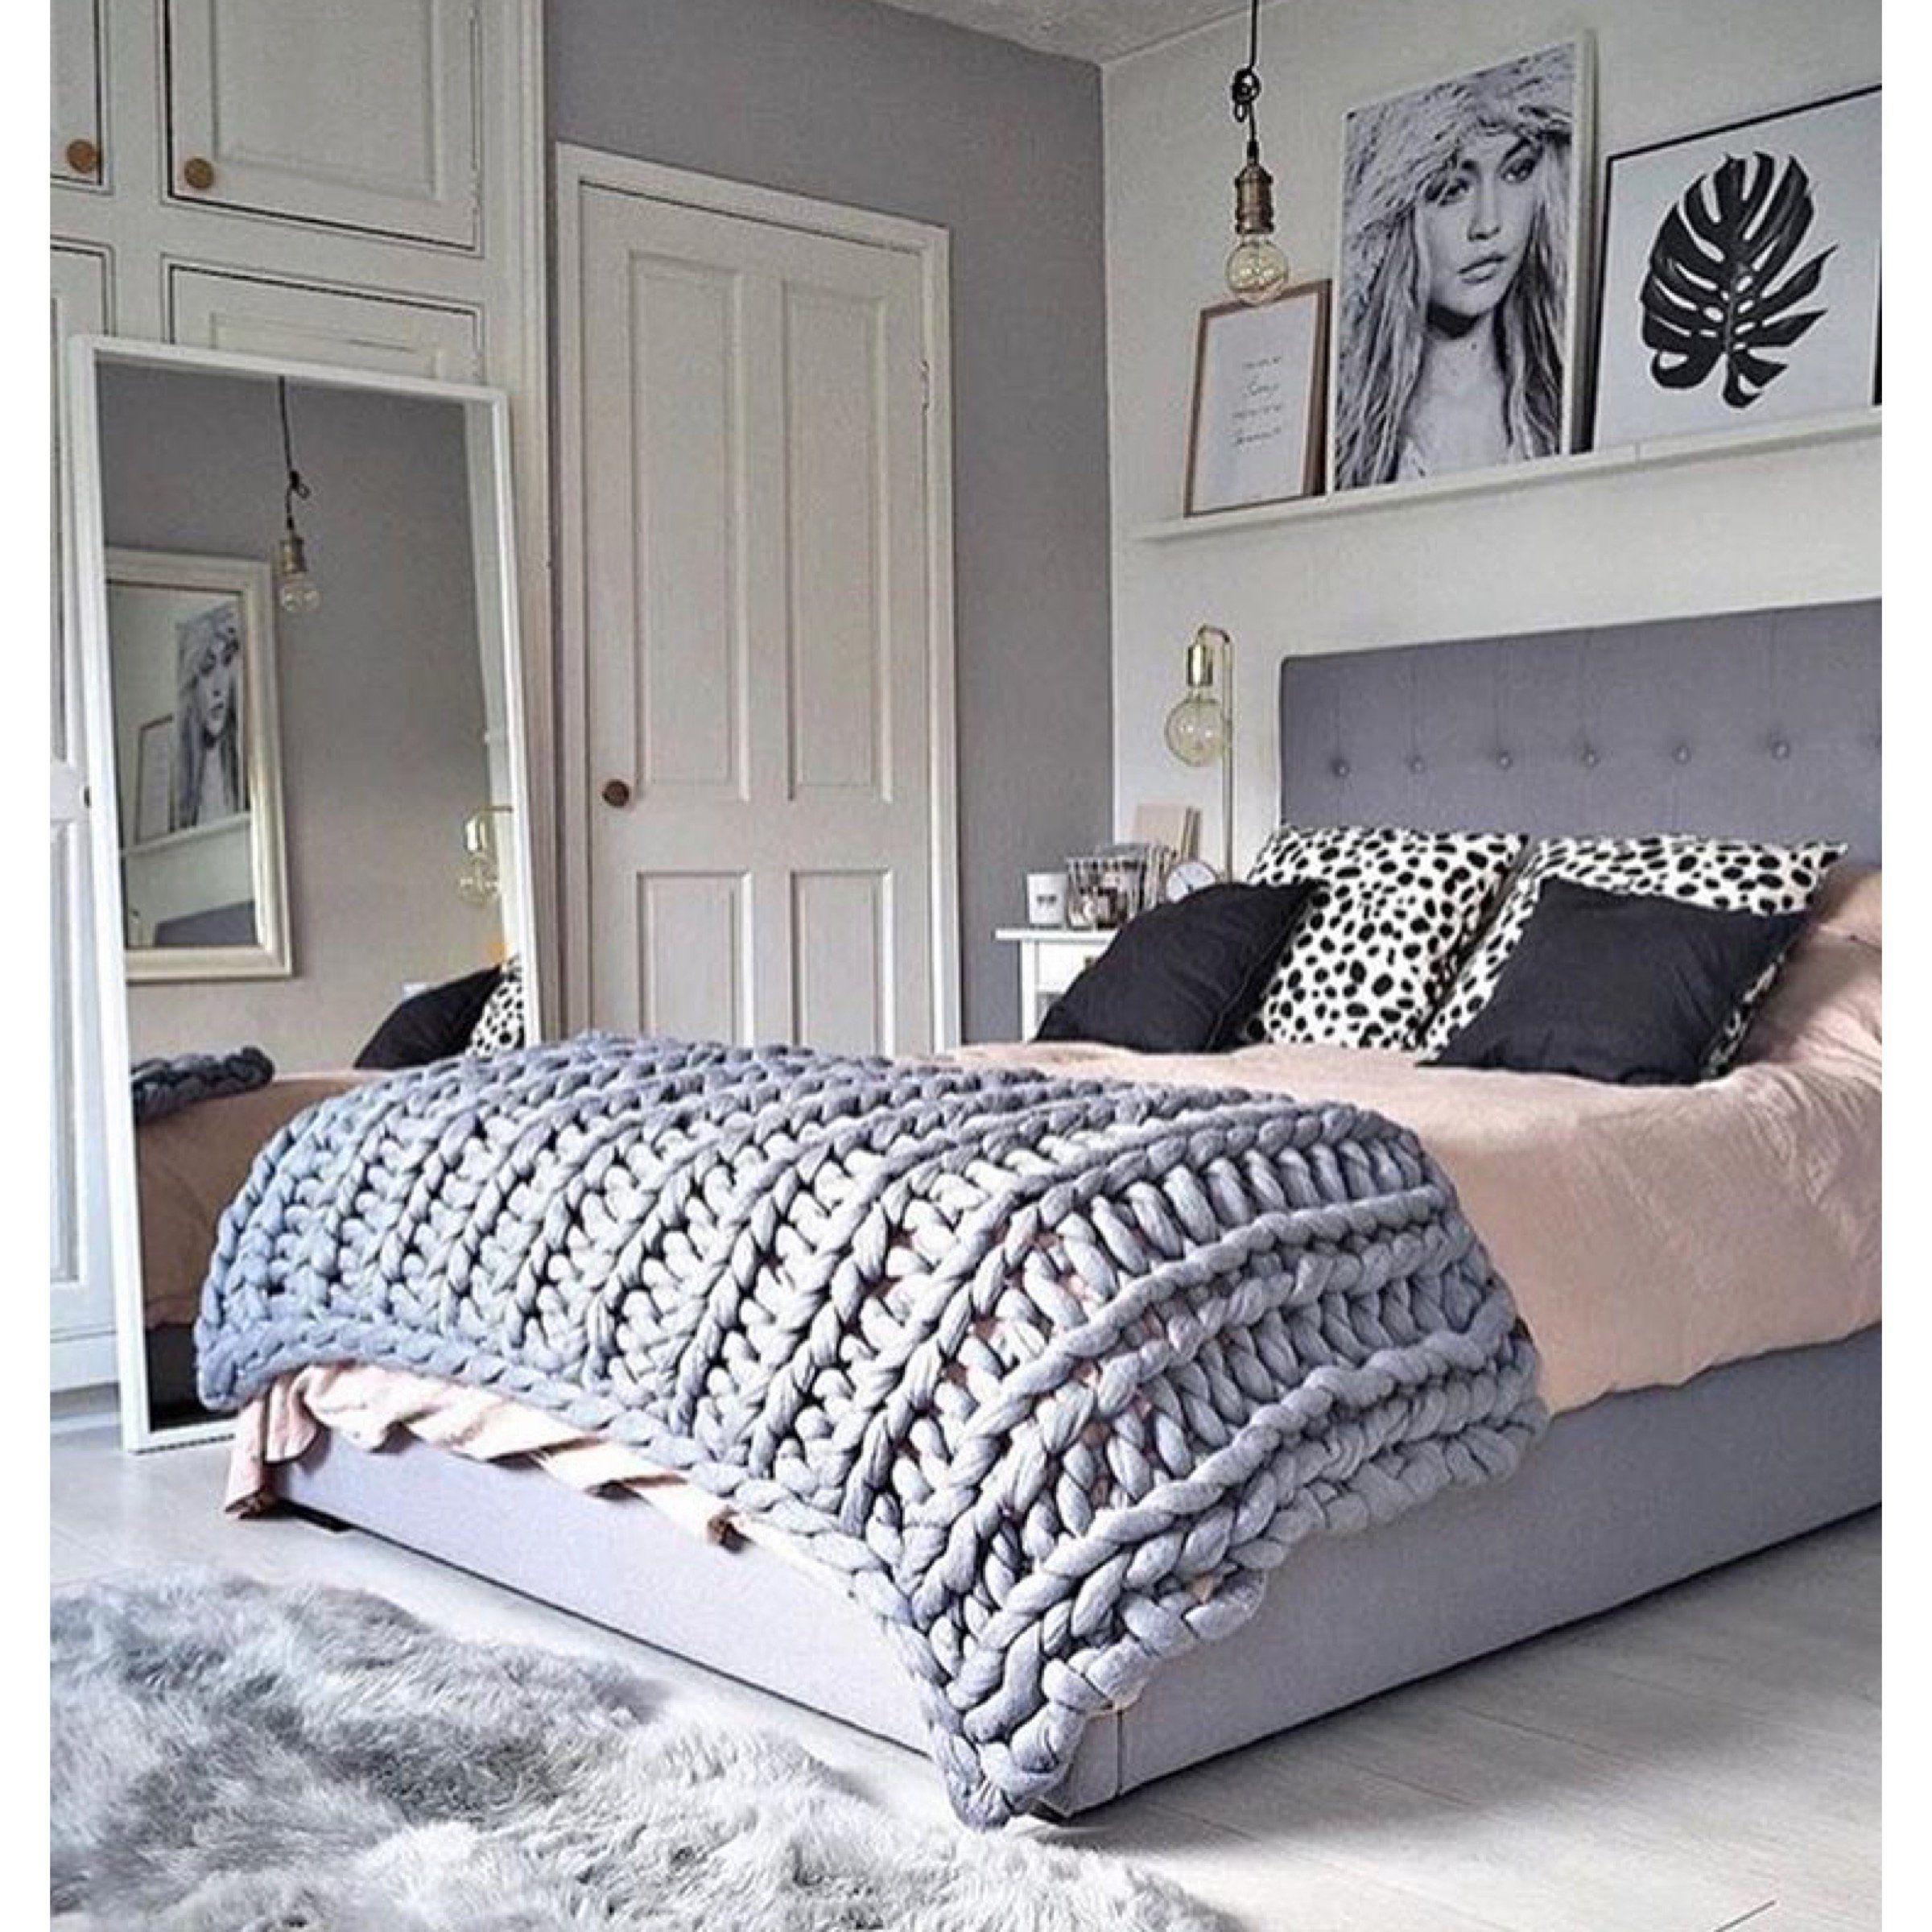 Wonderful Young Adult Bedroom Ideas Interior Design Bedroom